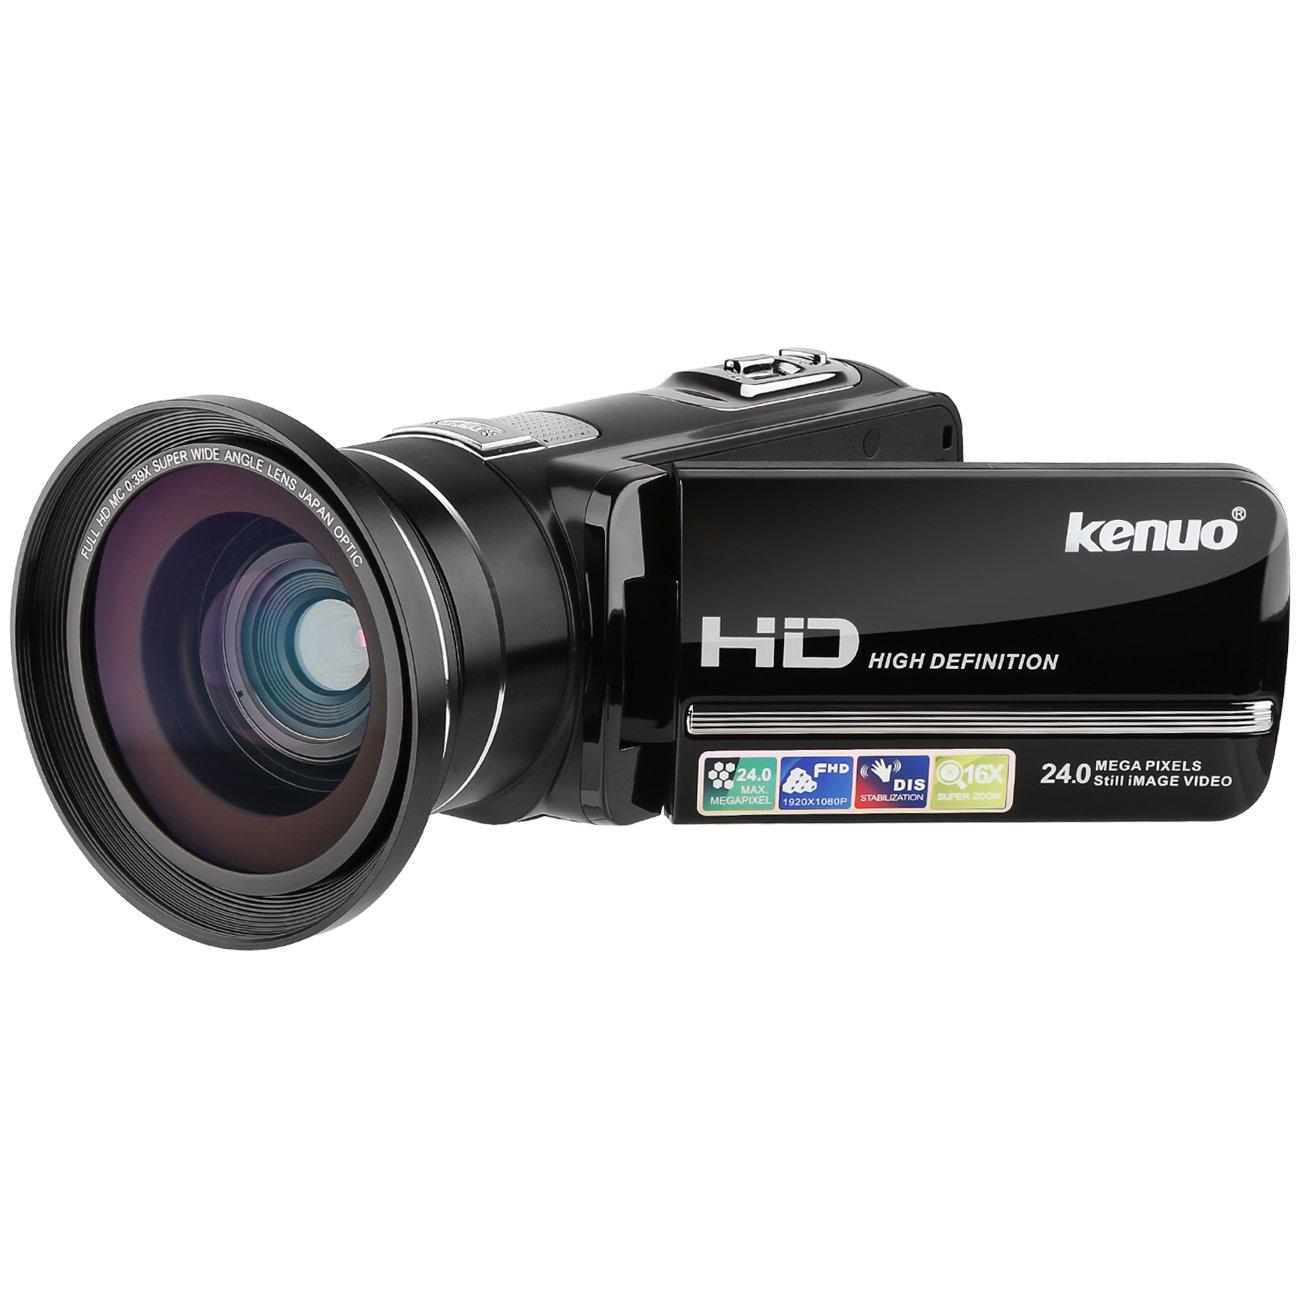 Camera Video Camera HD Camcorder,Kenuo 1080P 24MP HD Digital Recorder 3.0''TFT LCD Stabilization 270 Degree Rotation Screen Camera Bag Lithium Battery (Camera+Lens)